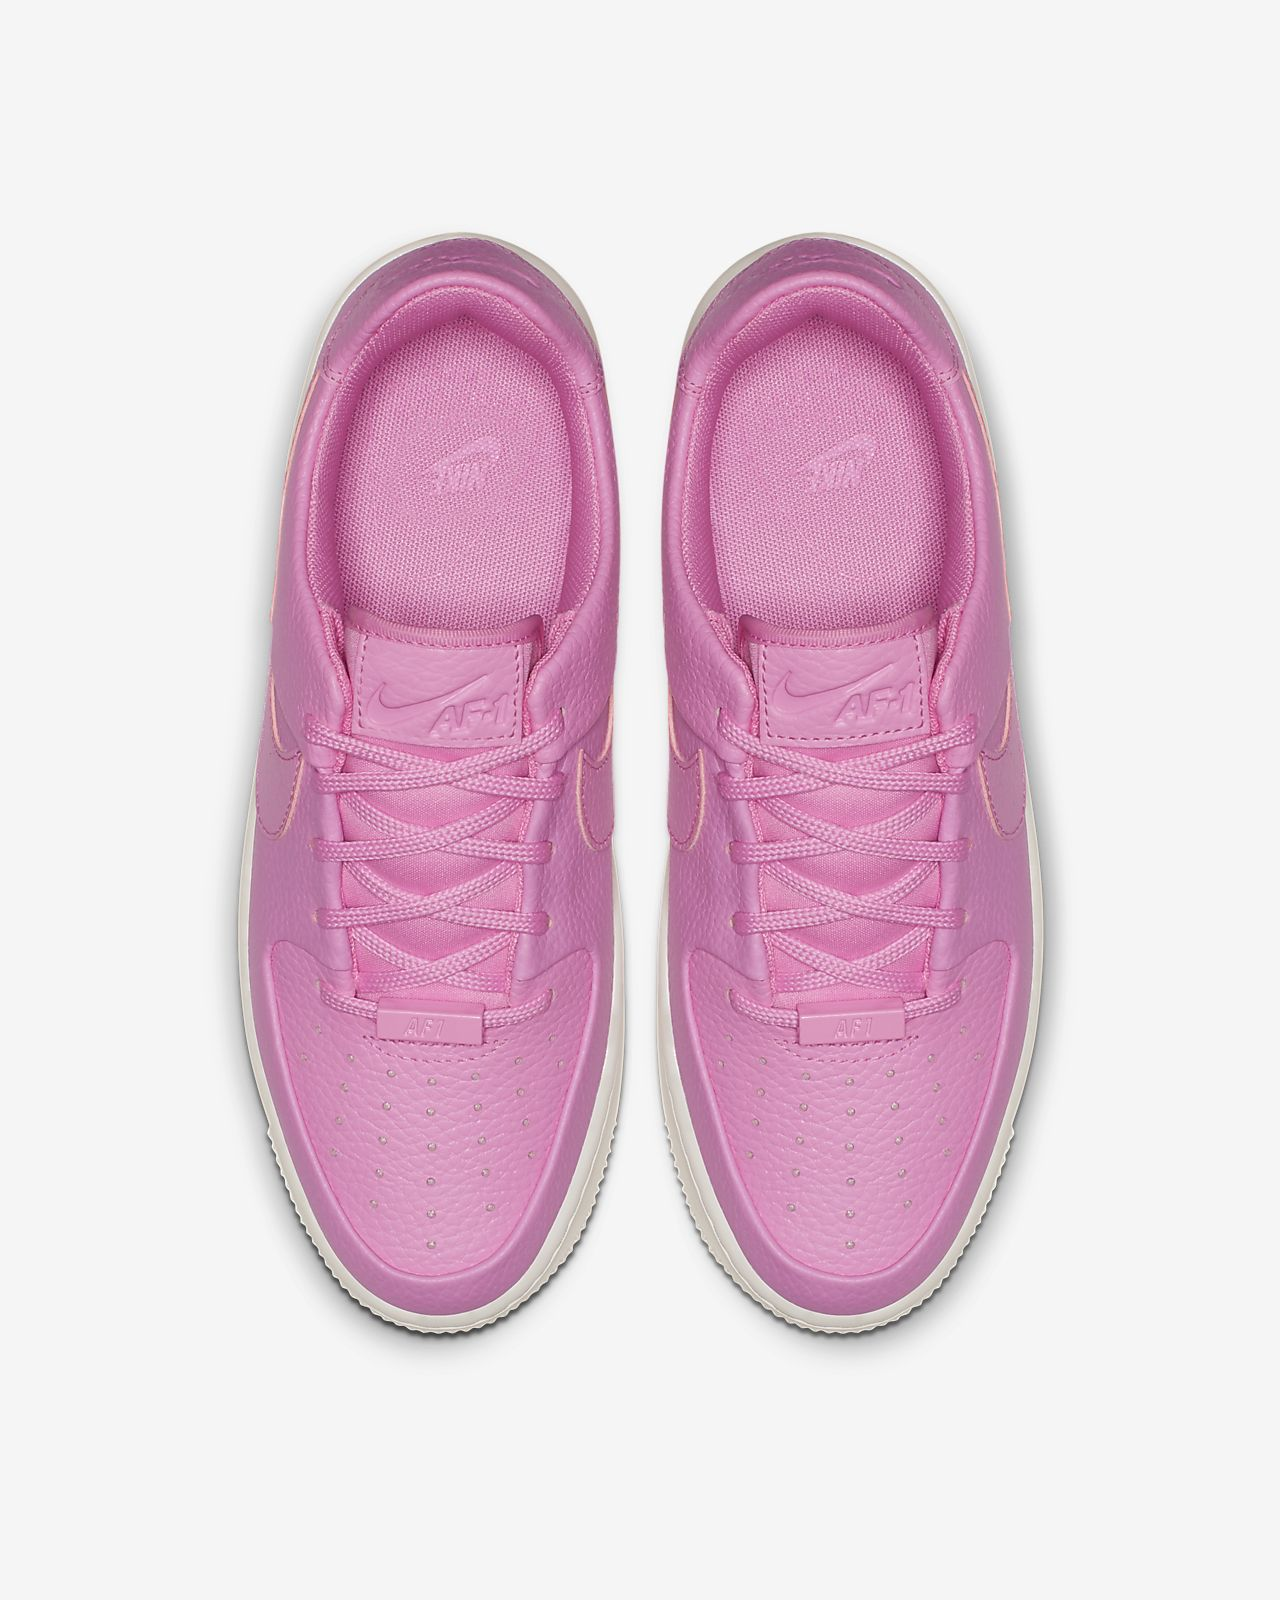 air max 1 sneakers laag maat 21 korting